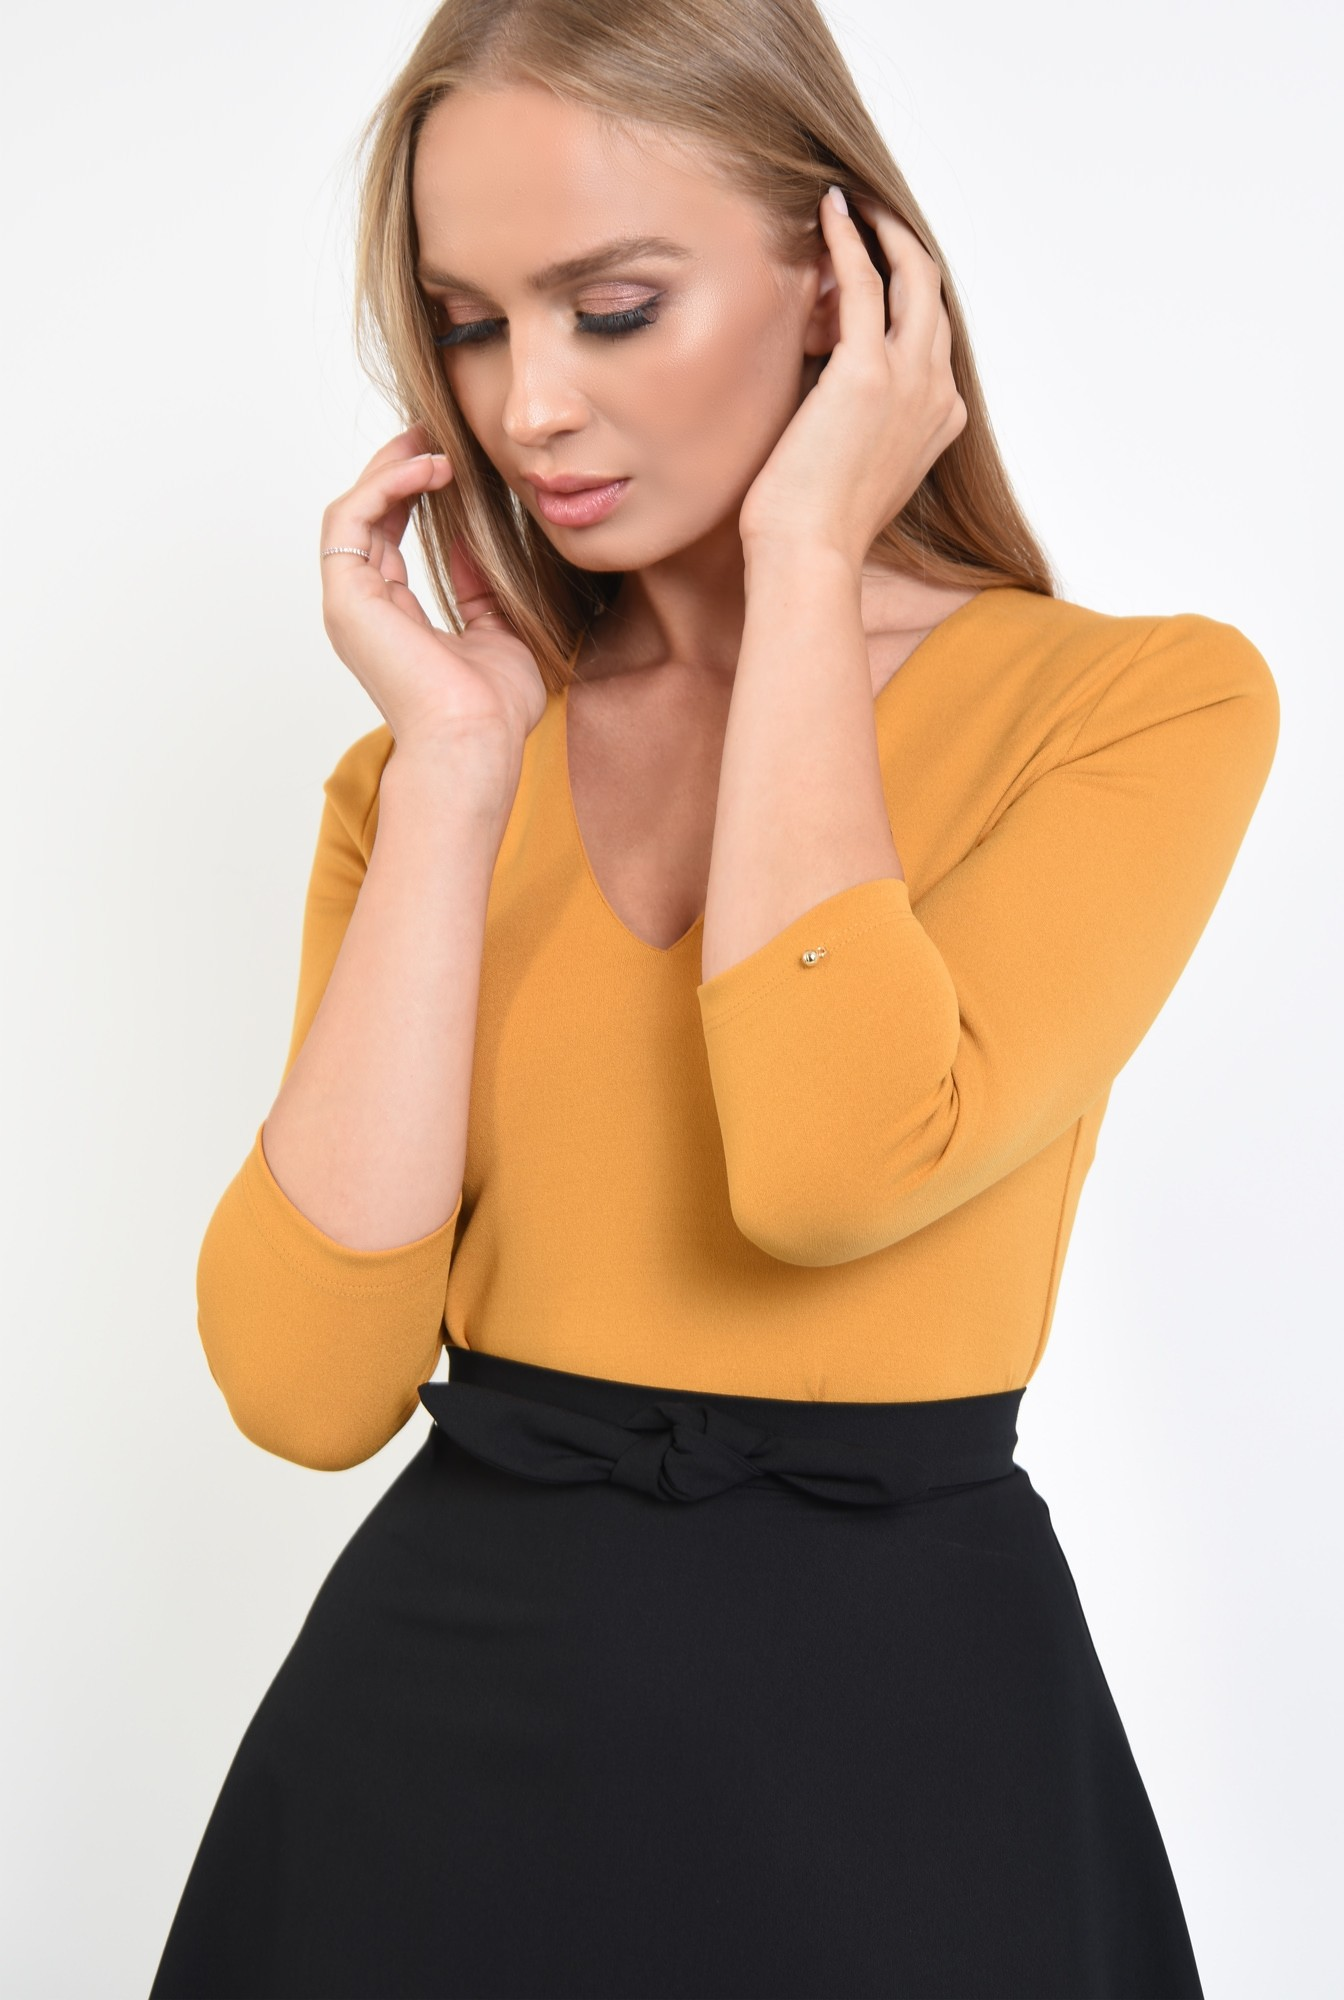 2 - 360 - bluza casual mustar, decoltata, croi drept, anchior, tesatura elastica